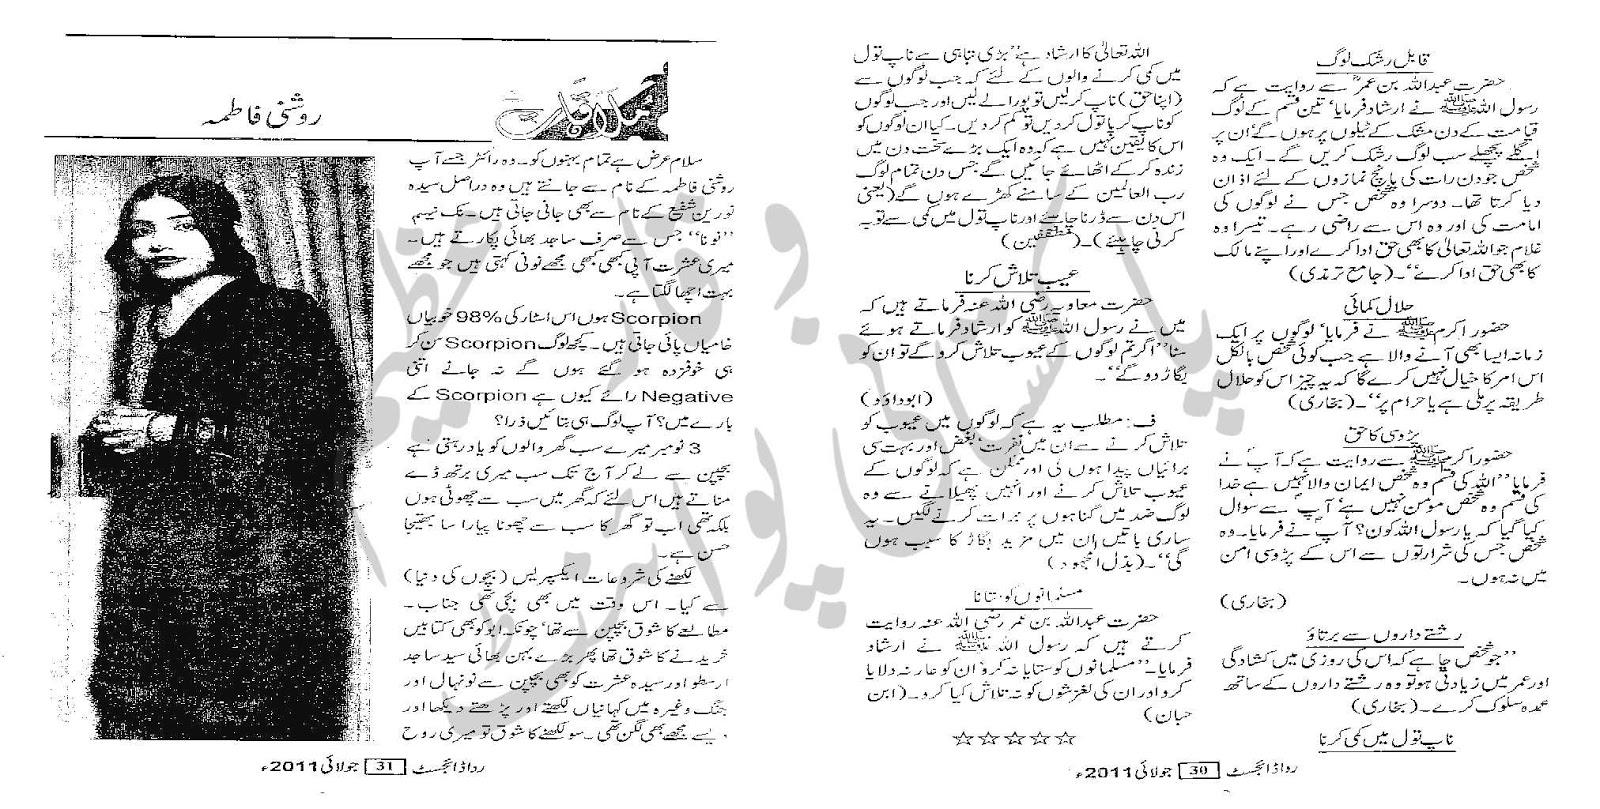 Free Urdu Digests: Rida Digest July 2011 Online Reading.